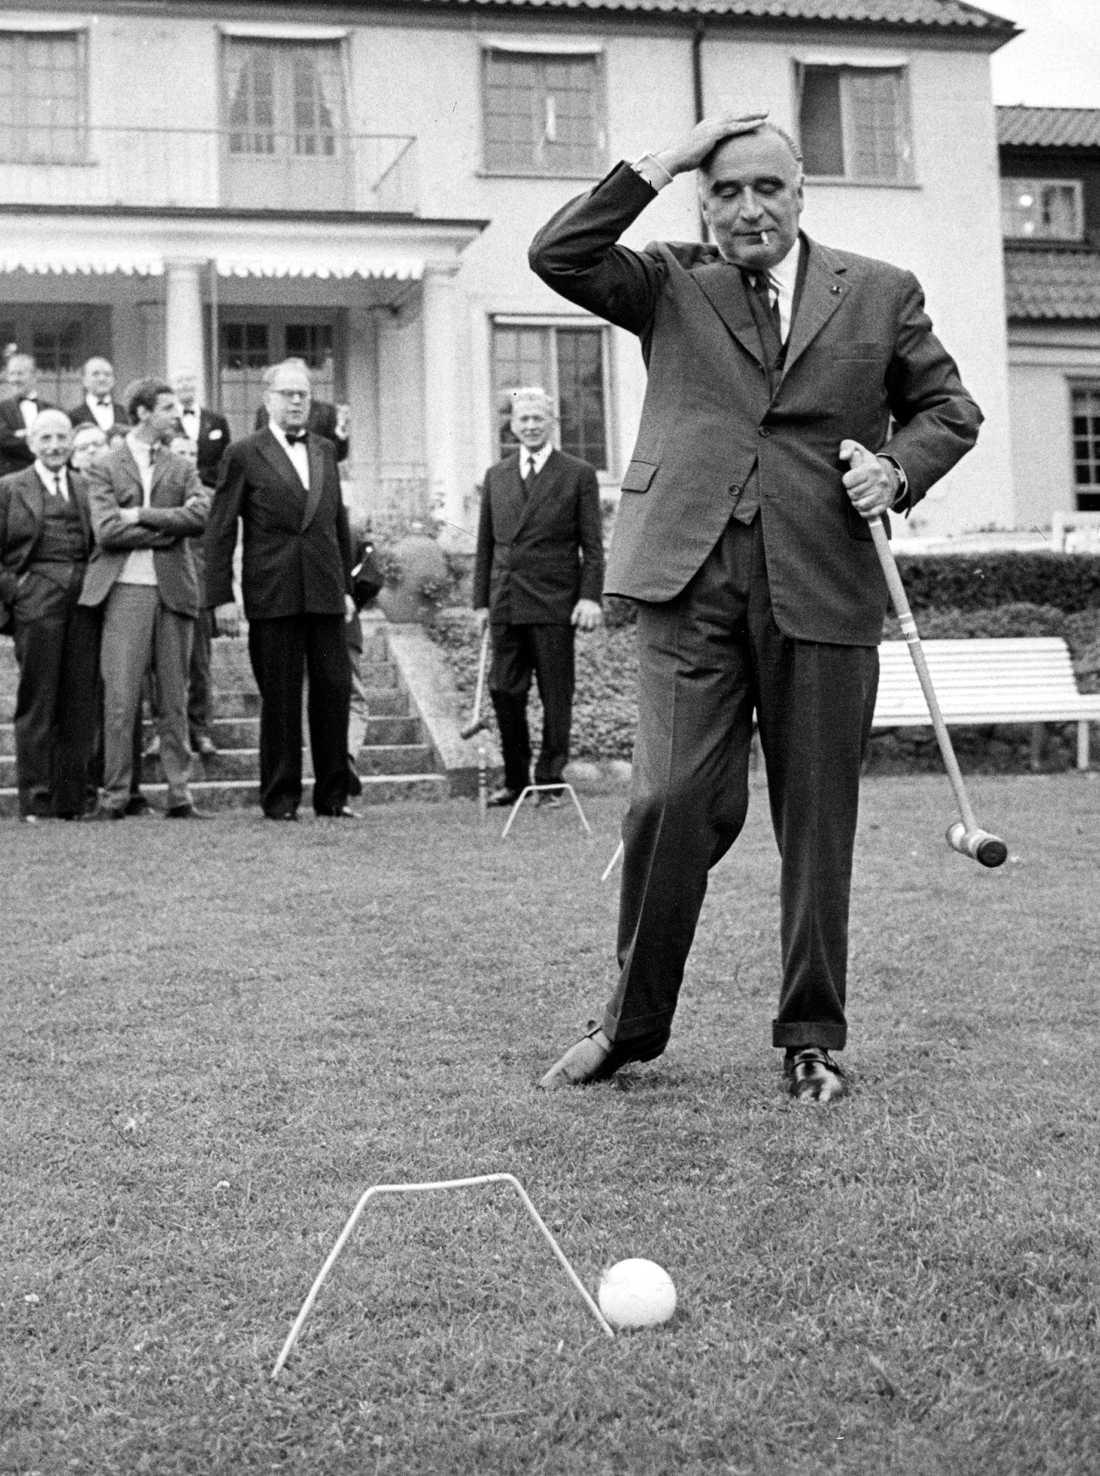 Frankrikes premiärminister Georges Pompidou spelar krocket på Harpsund 1964. I bakgrunden statsminister Tage Erlander och frankrikes utrikesminister Couve de Murville (med klubba i handen). Arkivbild.